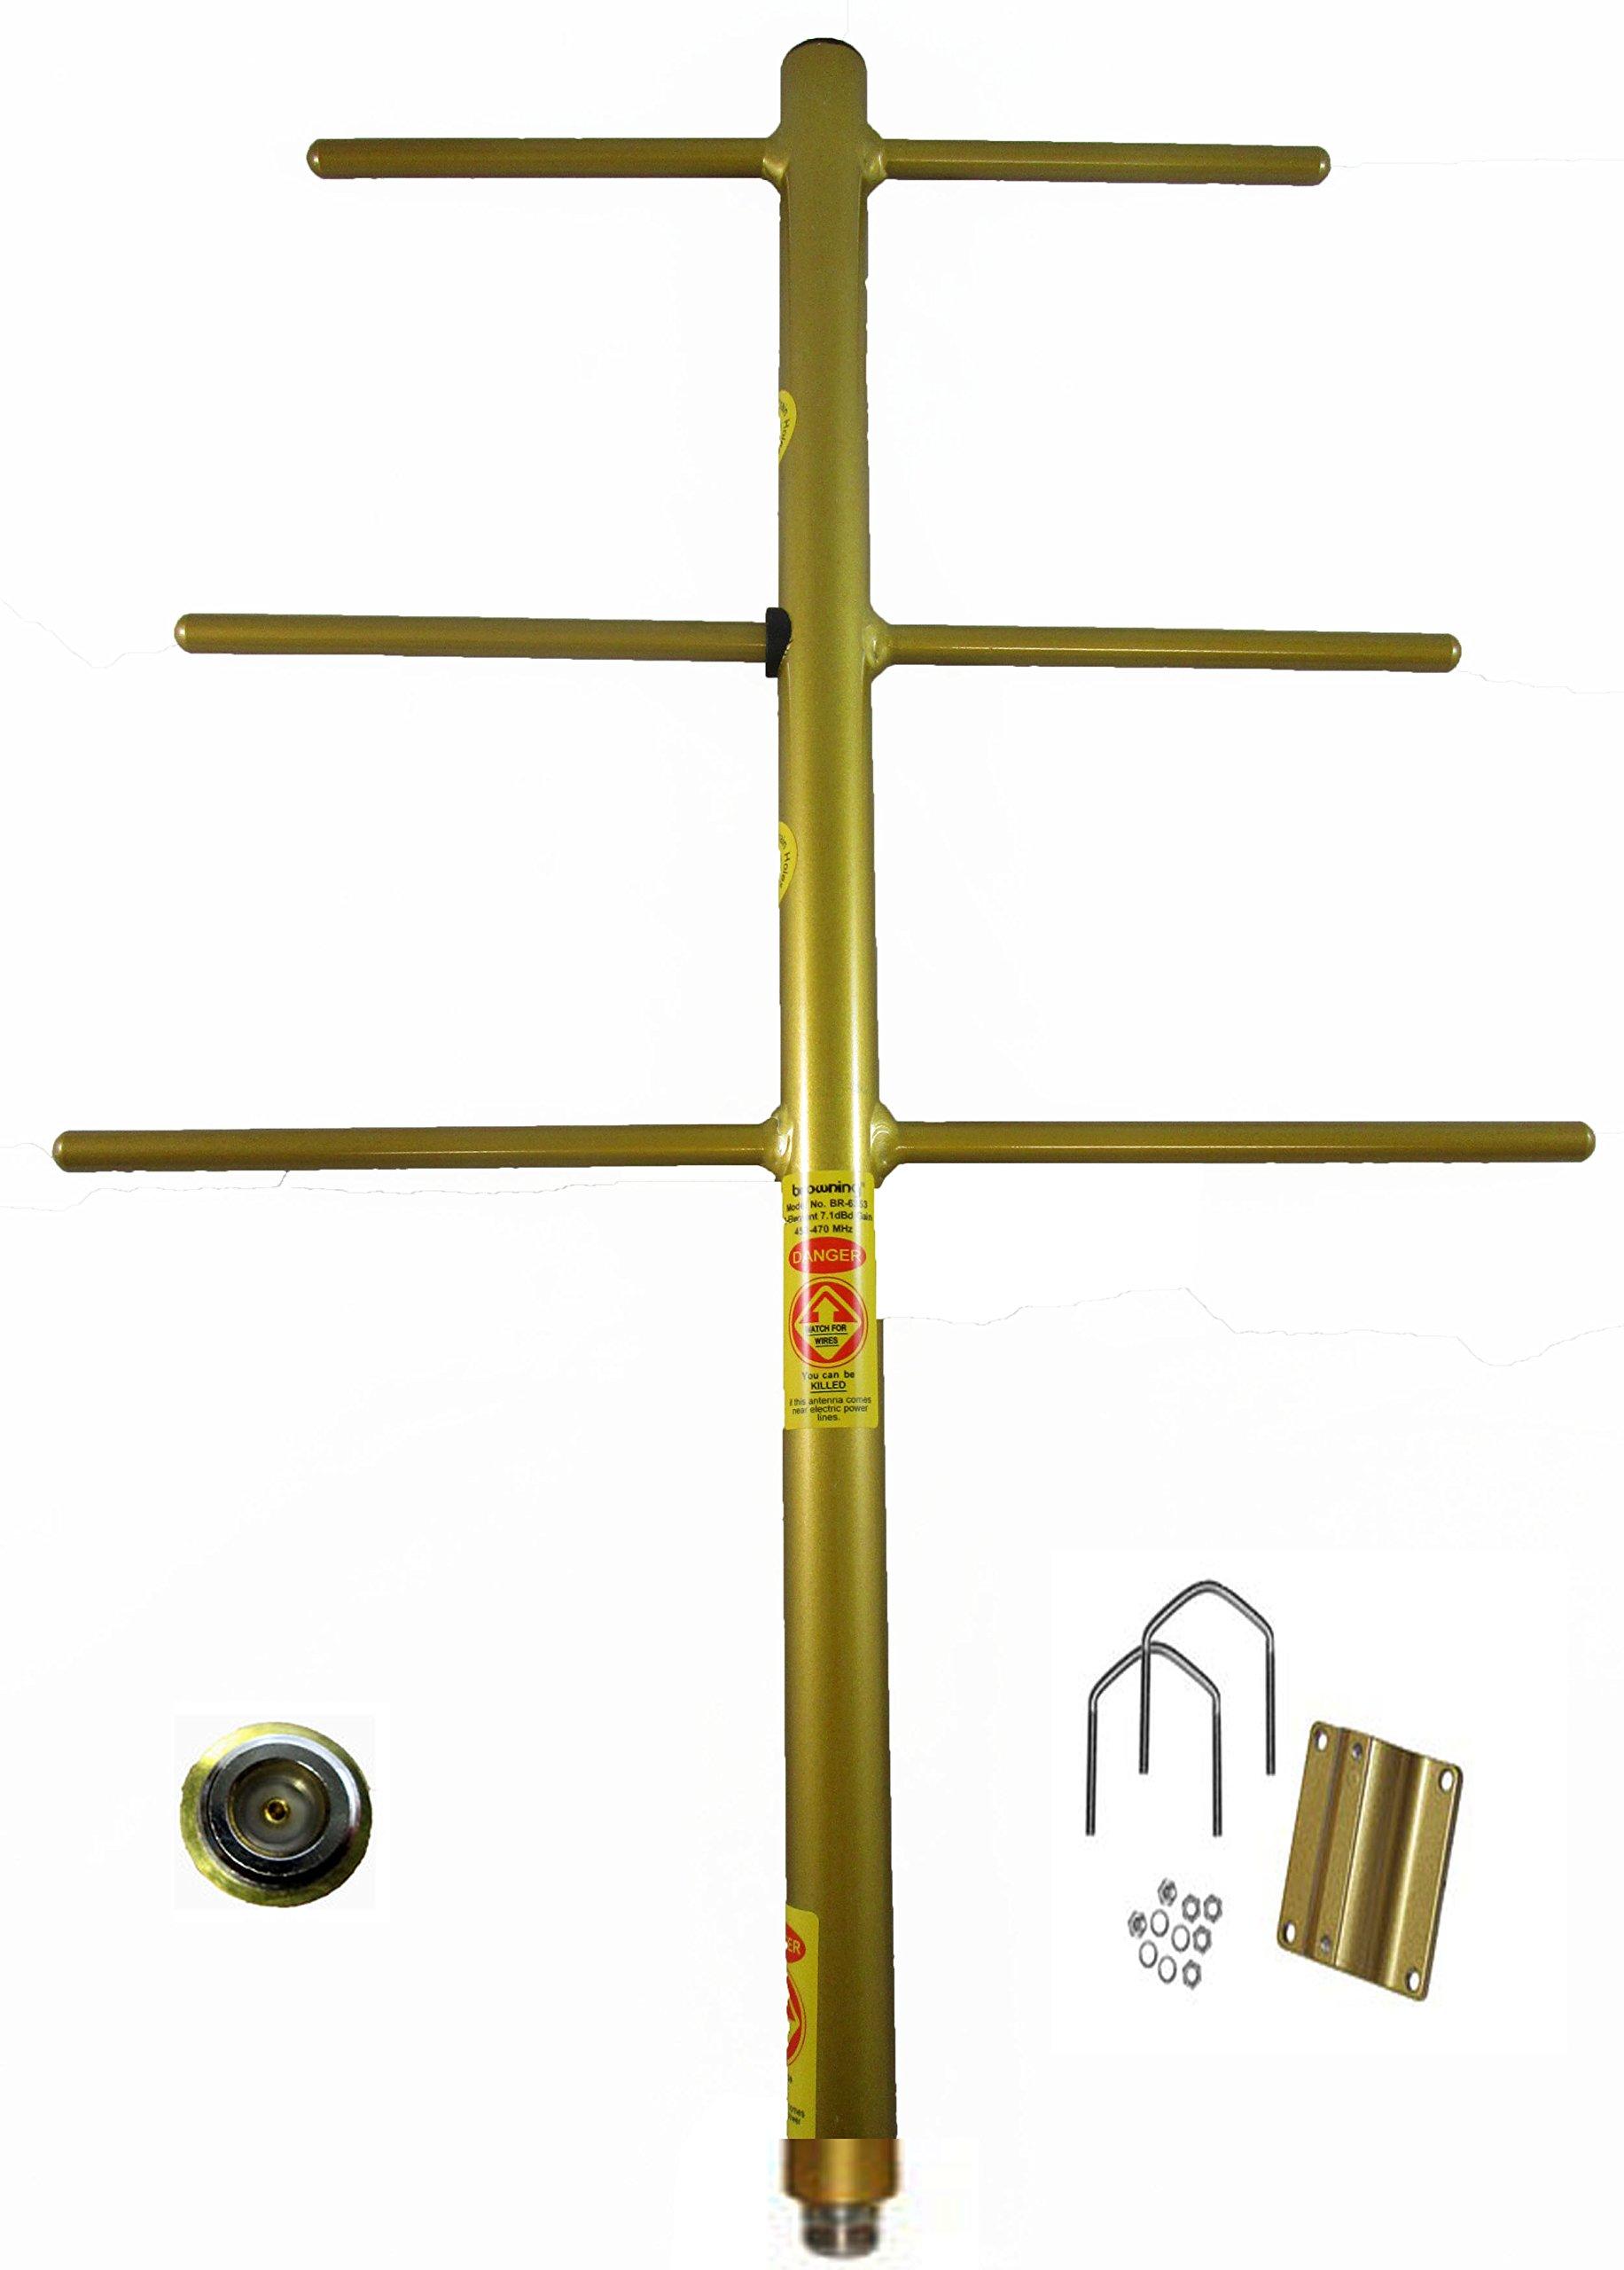 Tram Browning BR-6353 7.1dB fully welded Yagi UHF 450-470MHz antenna